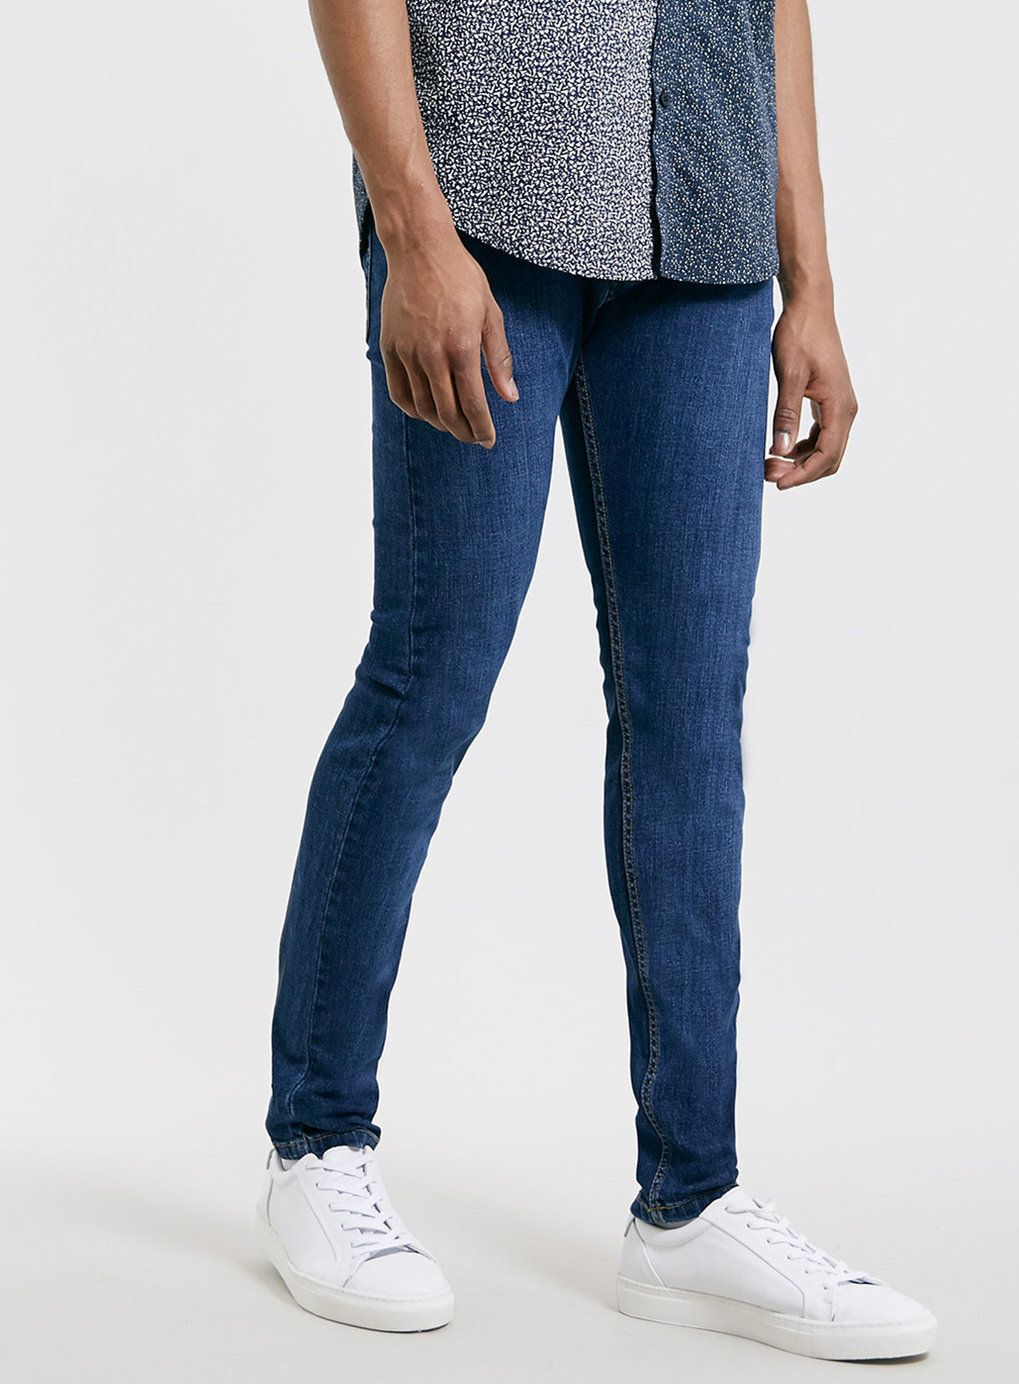 Mid Bright Blue Stretch Skinny Jeans | Productos, Jeans ajustados ...